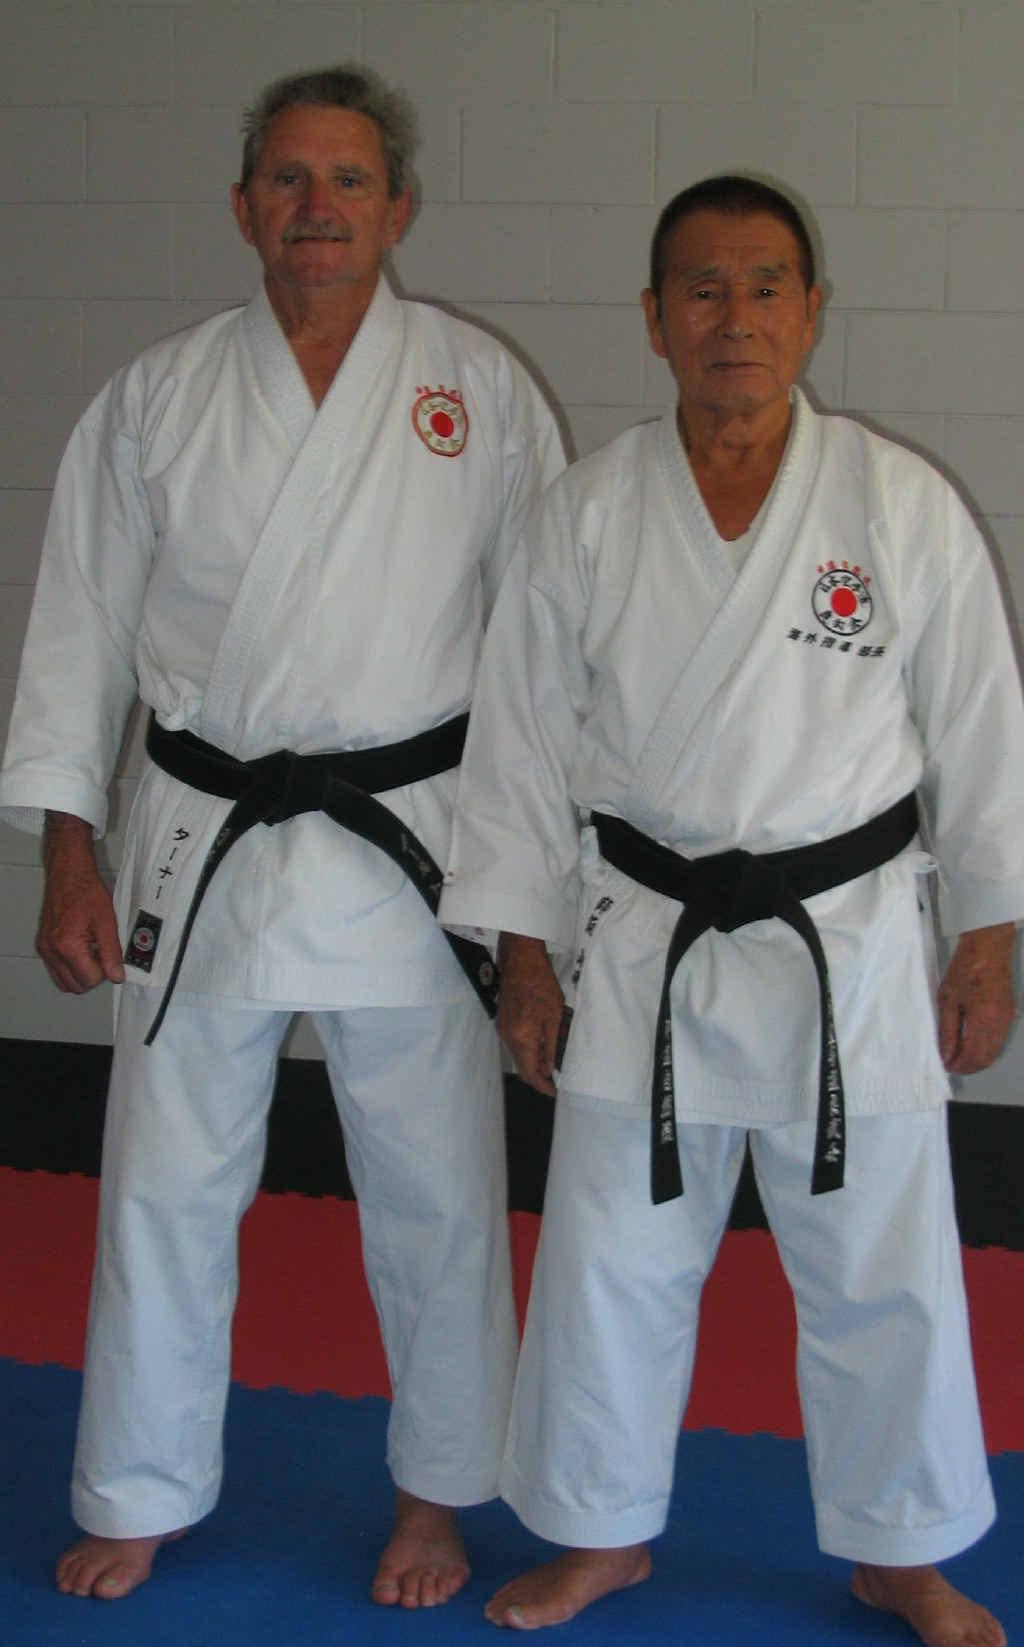 SKILLED: Sensei Noel Turner (left) and Sensei Kiyoshi Yamazaki.